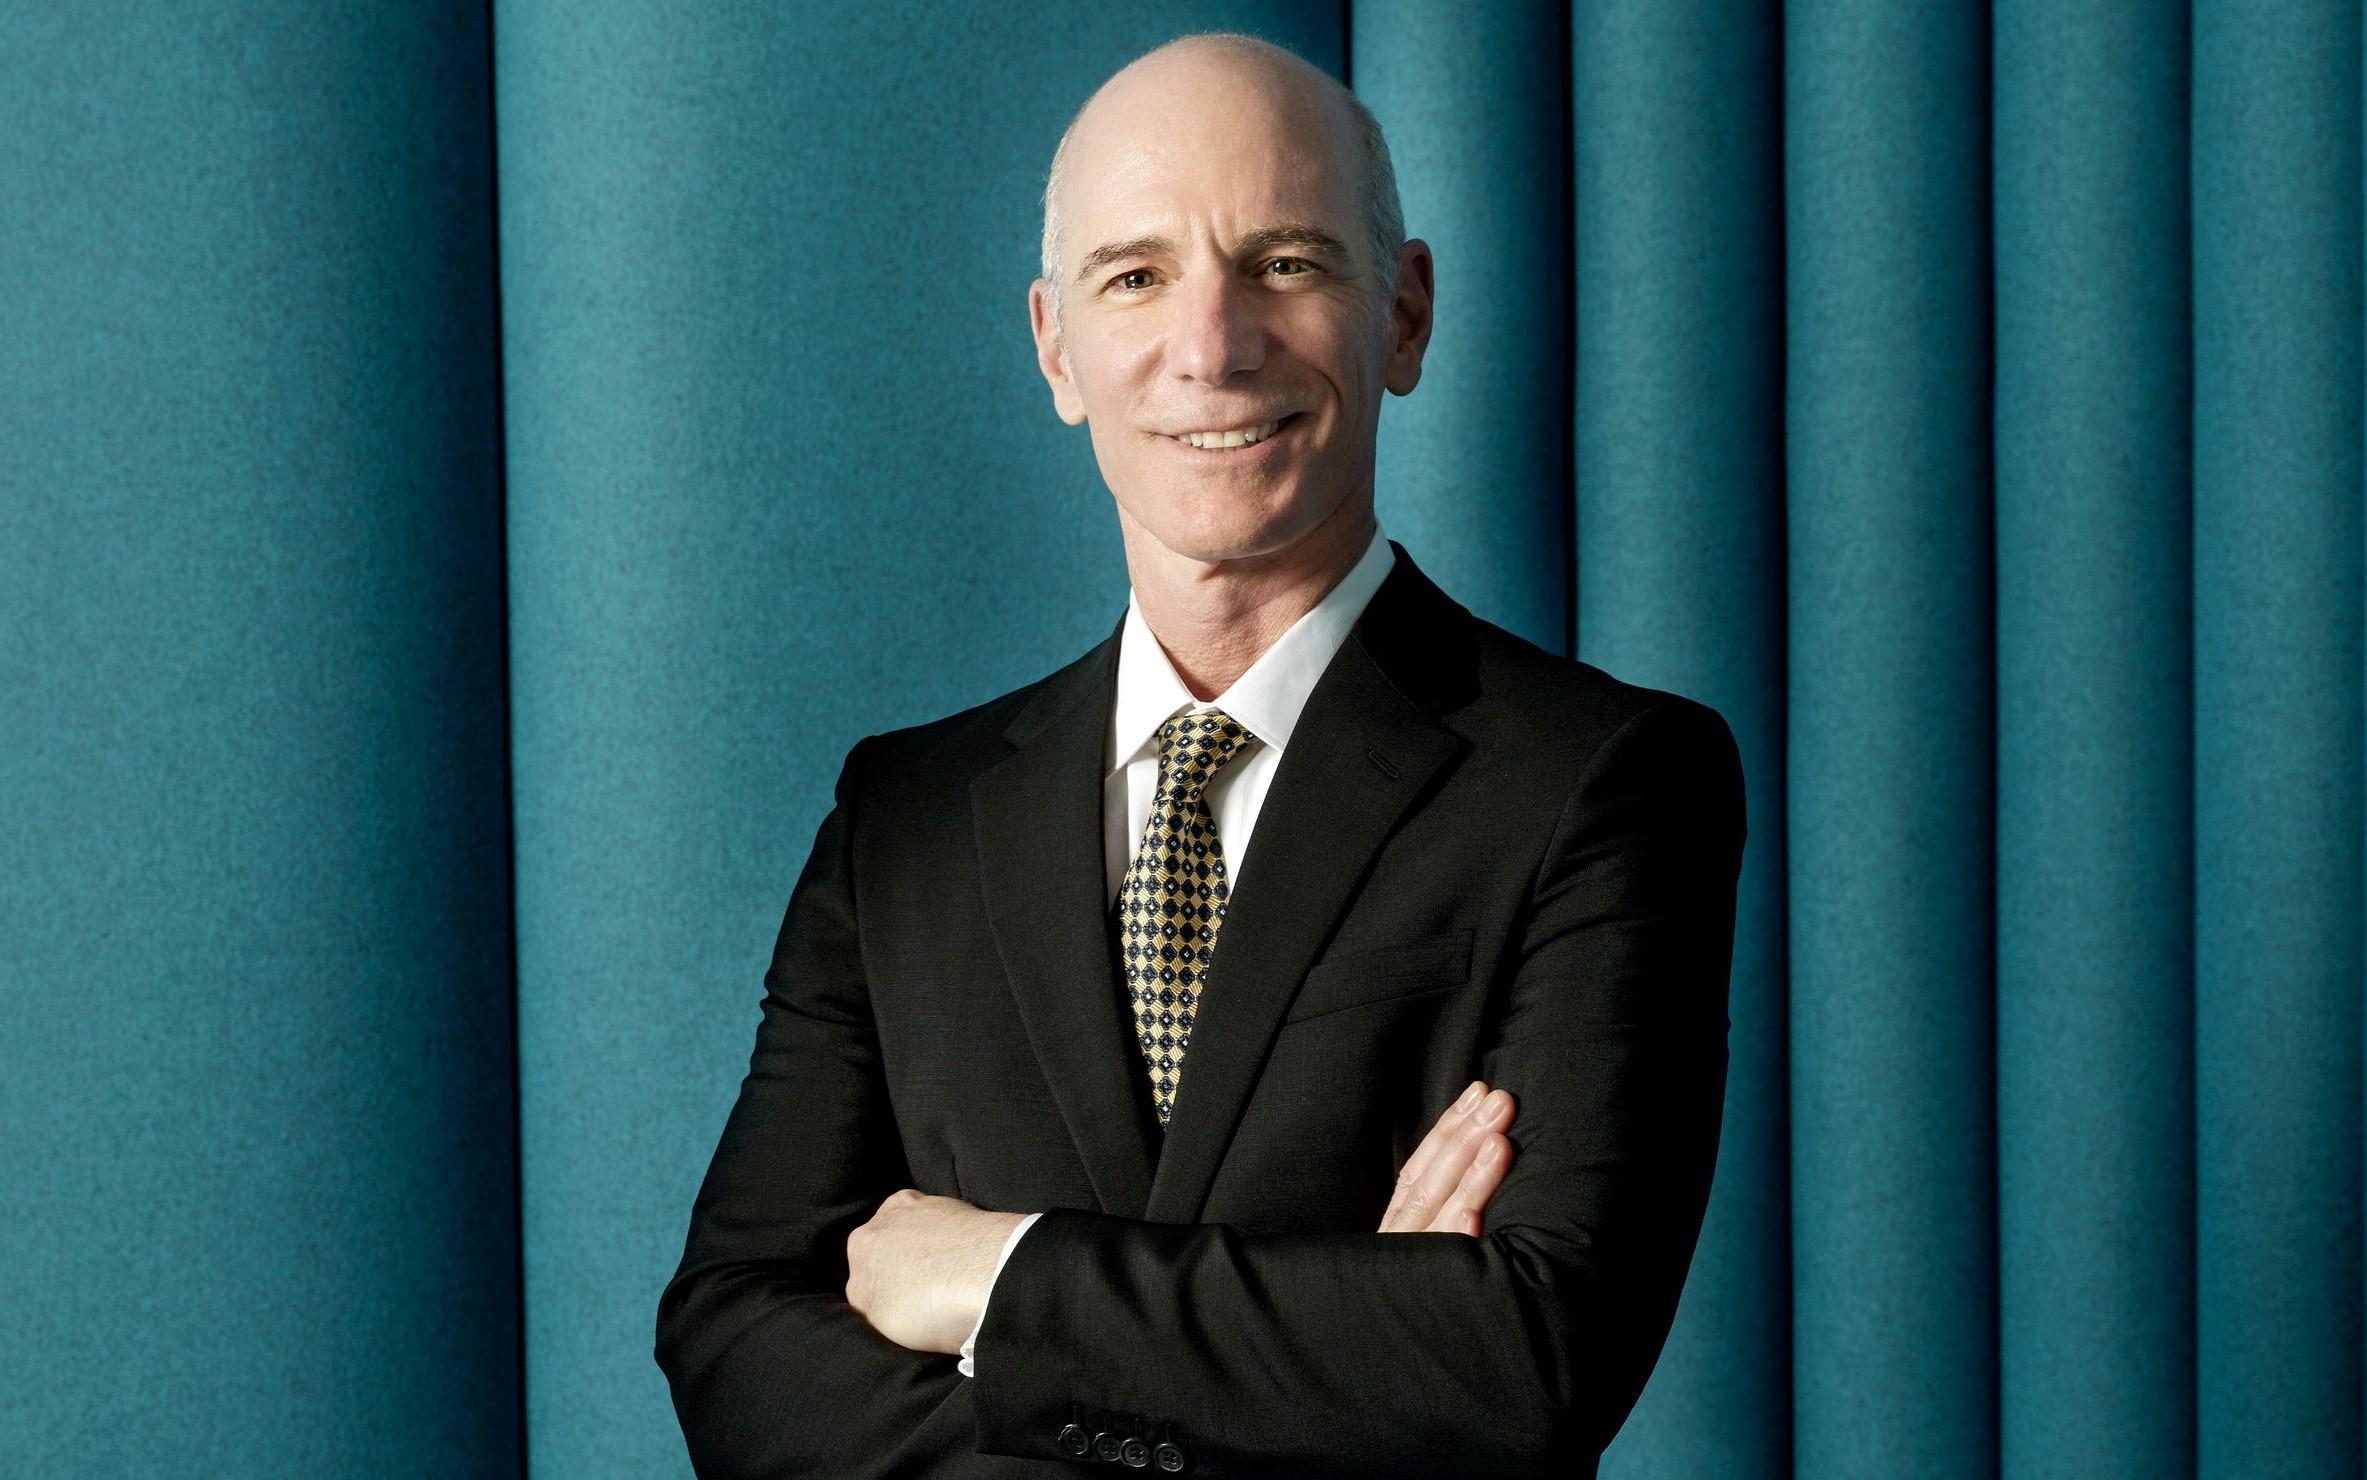 DocMagic CEO and president Dominic Iannitti won the 2020 Lending Luminary award.